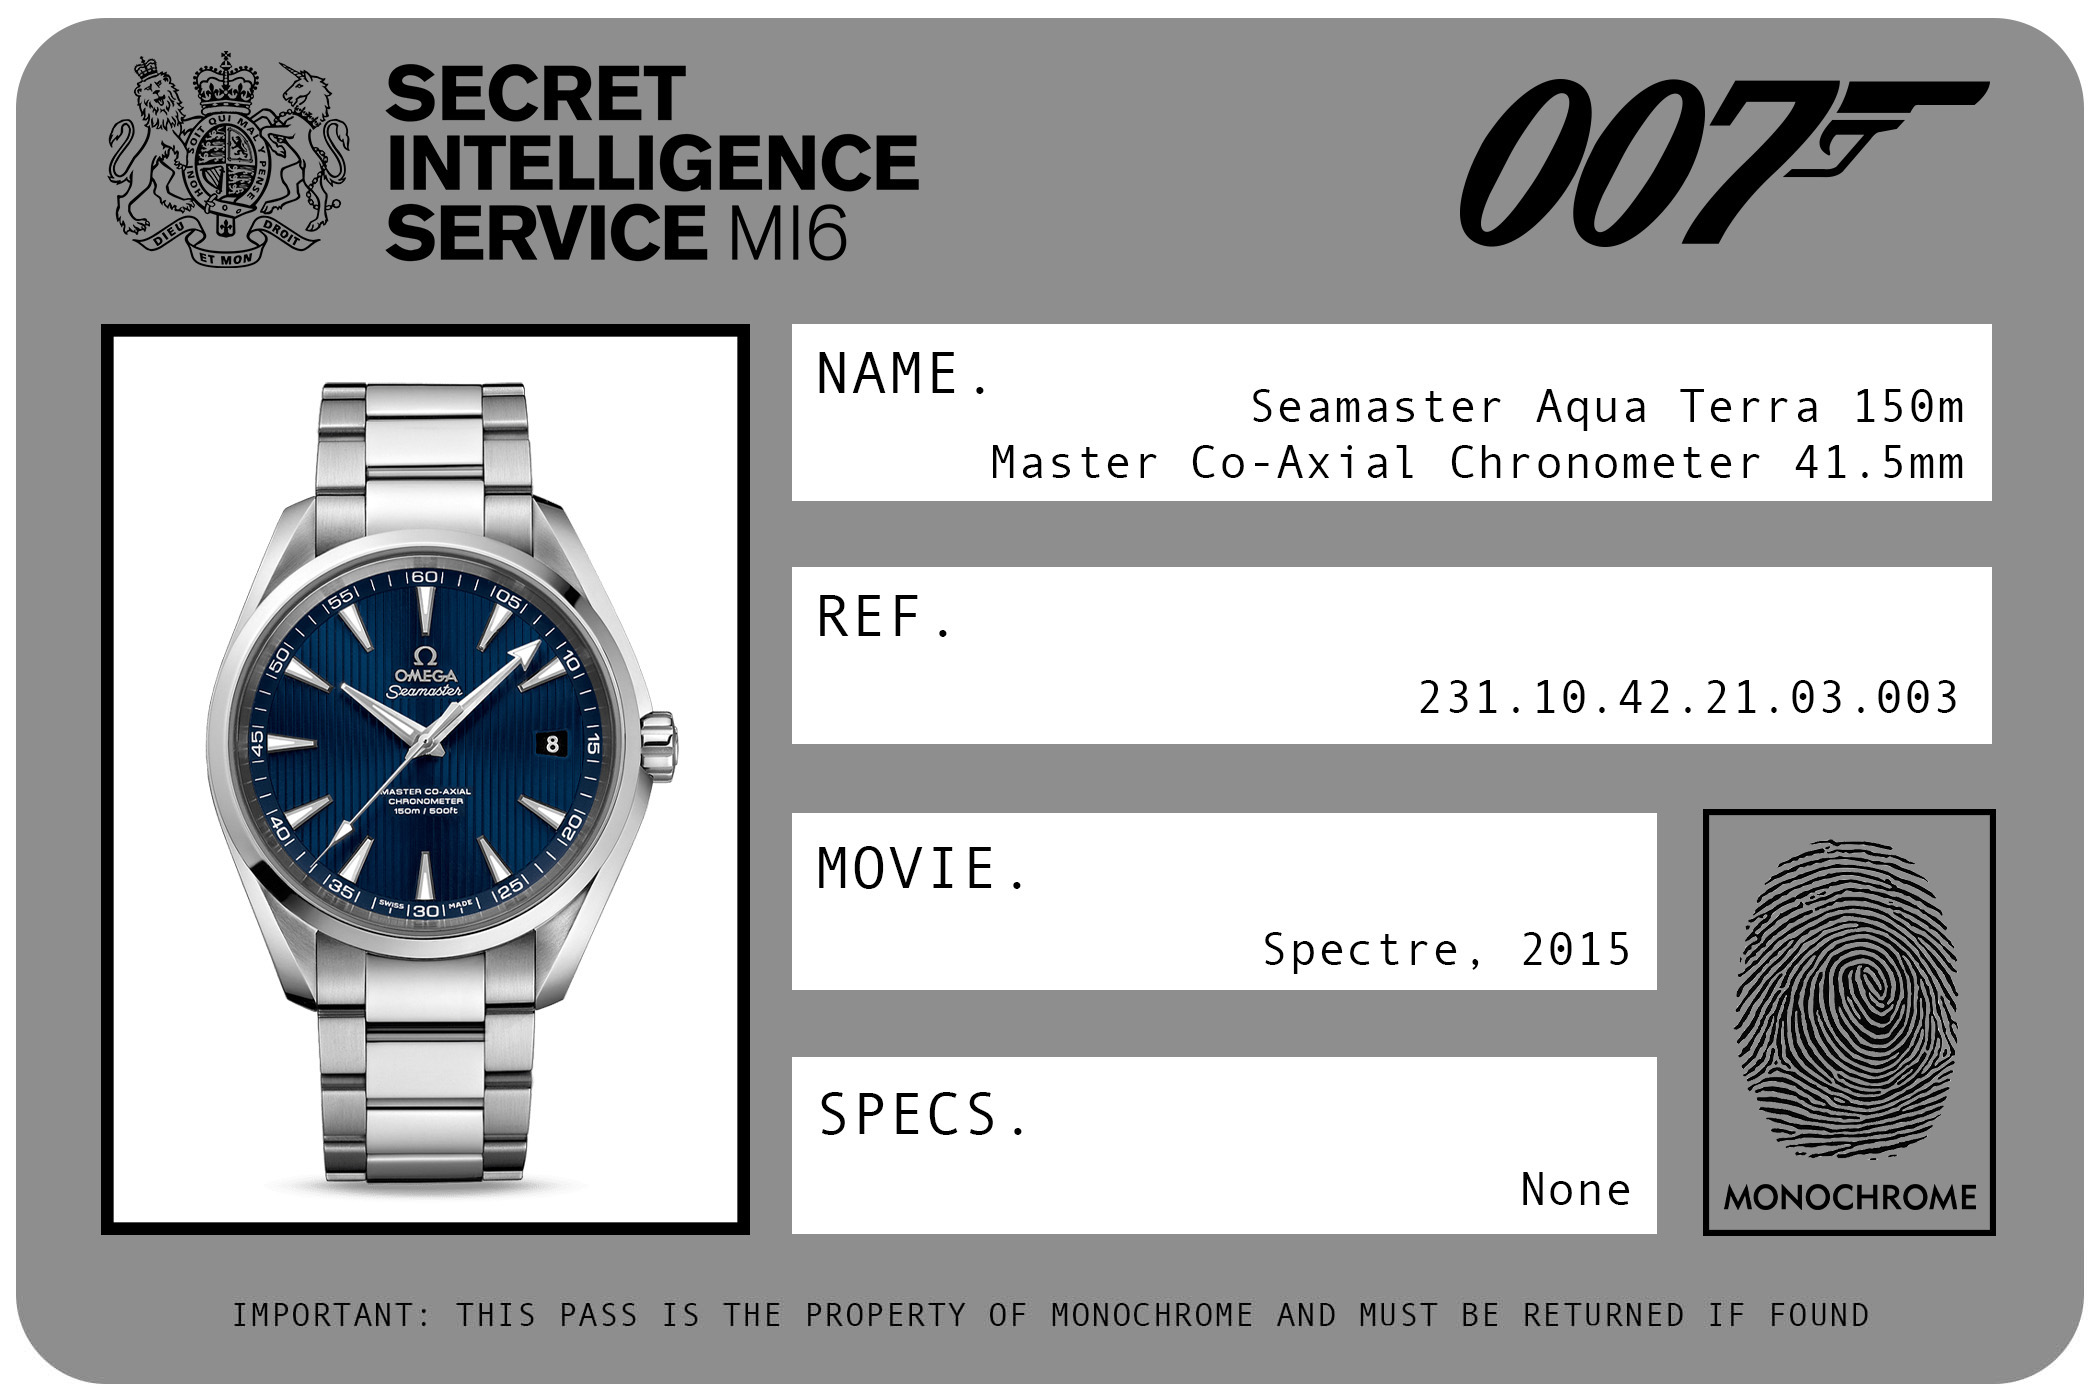 Omega Seamaster Aqua Terra 150m Master Co-Axial Chronometer 41.5mm 231.10.42.21.03.003 James Bond Spectre ID Card 2015